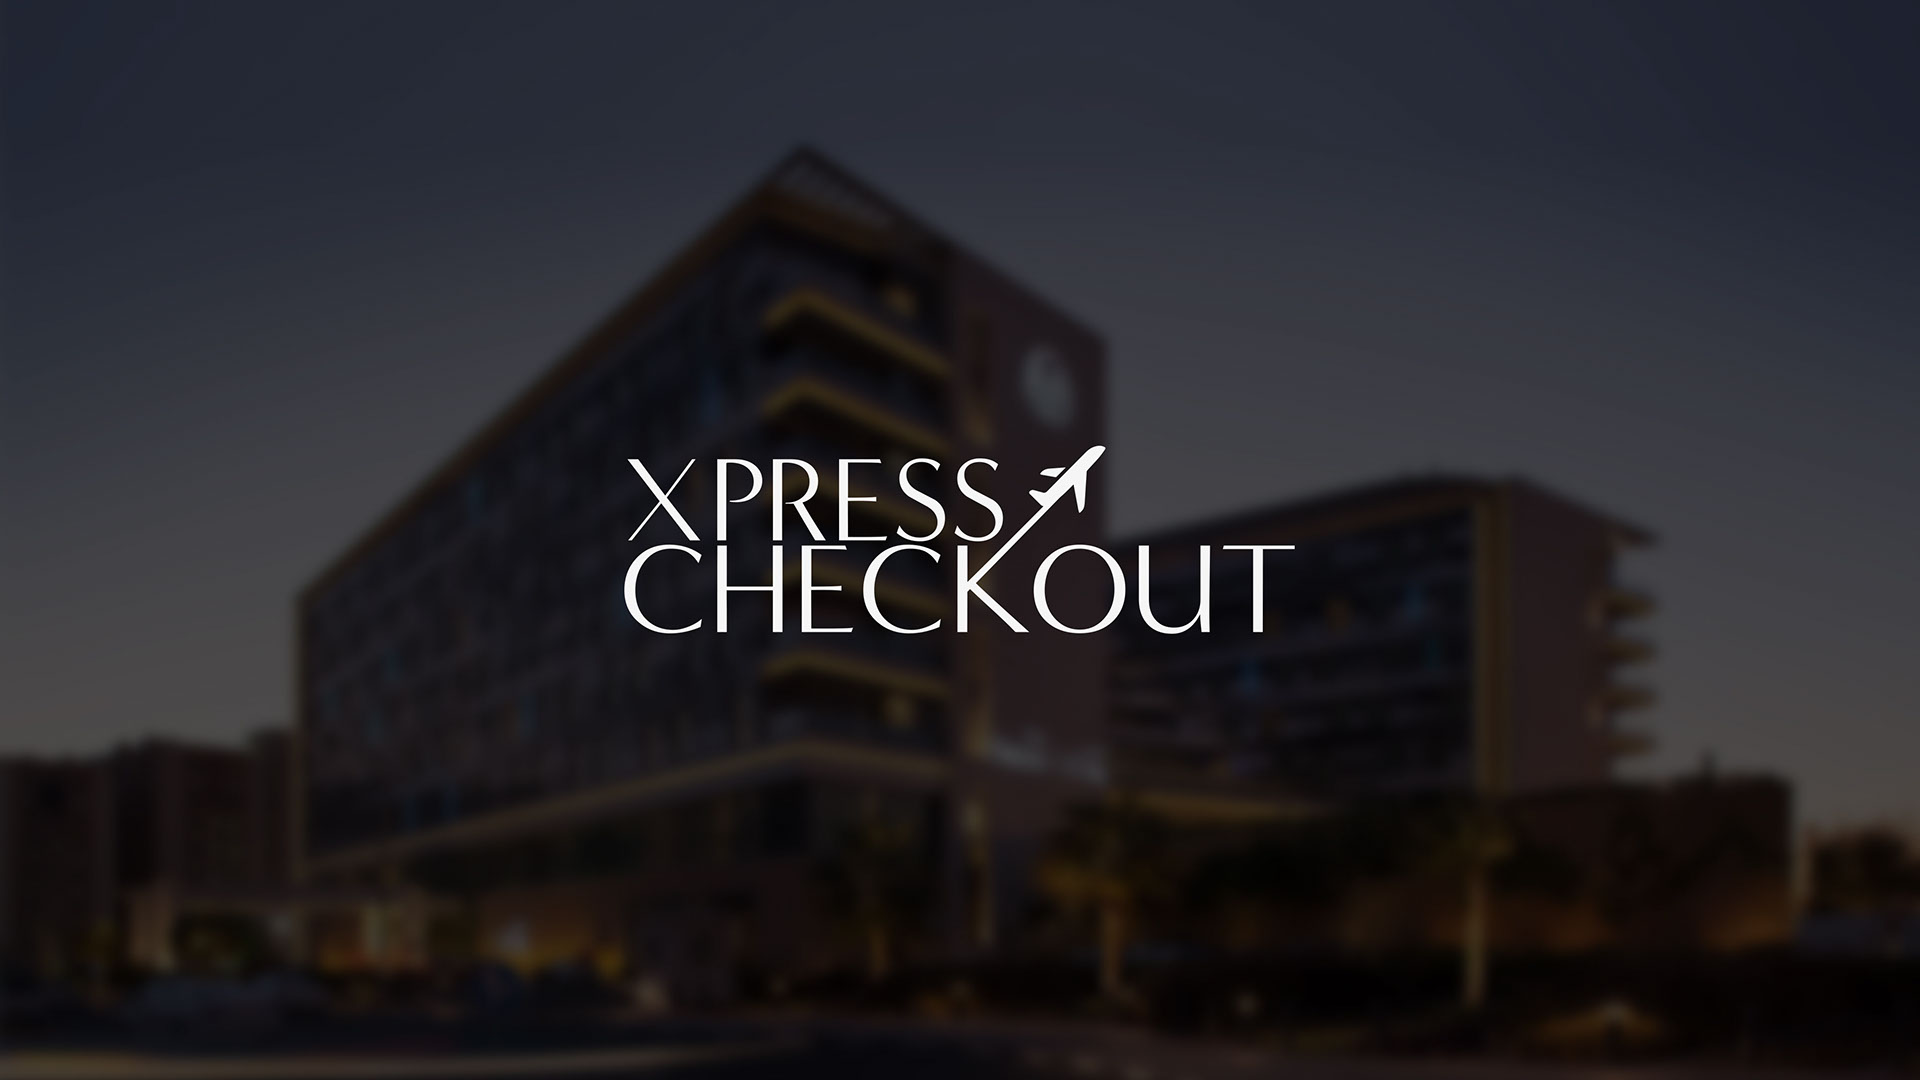 oryx rotana xpress checkout charith design graphic designer in qatar